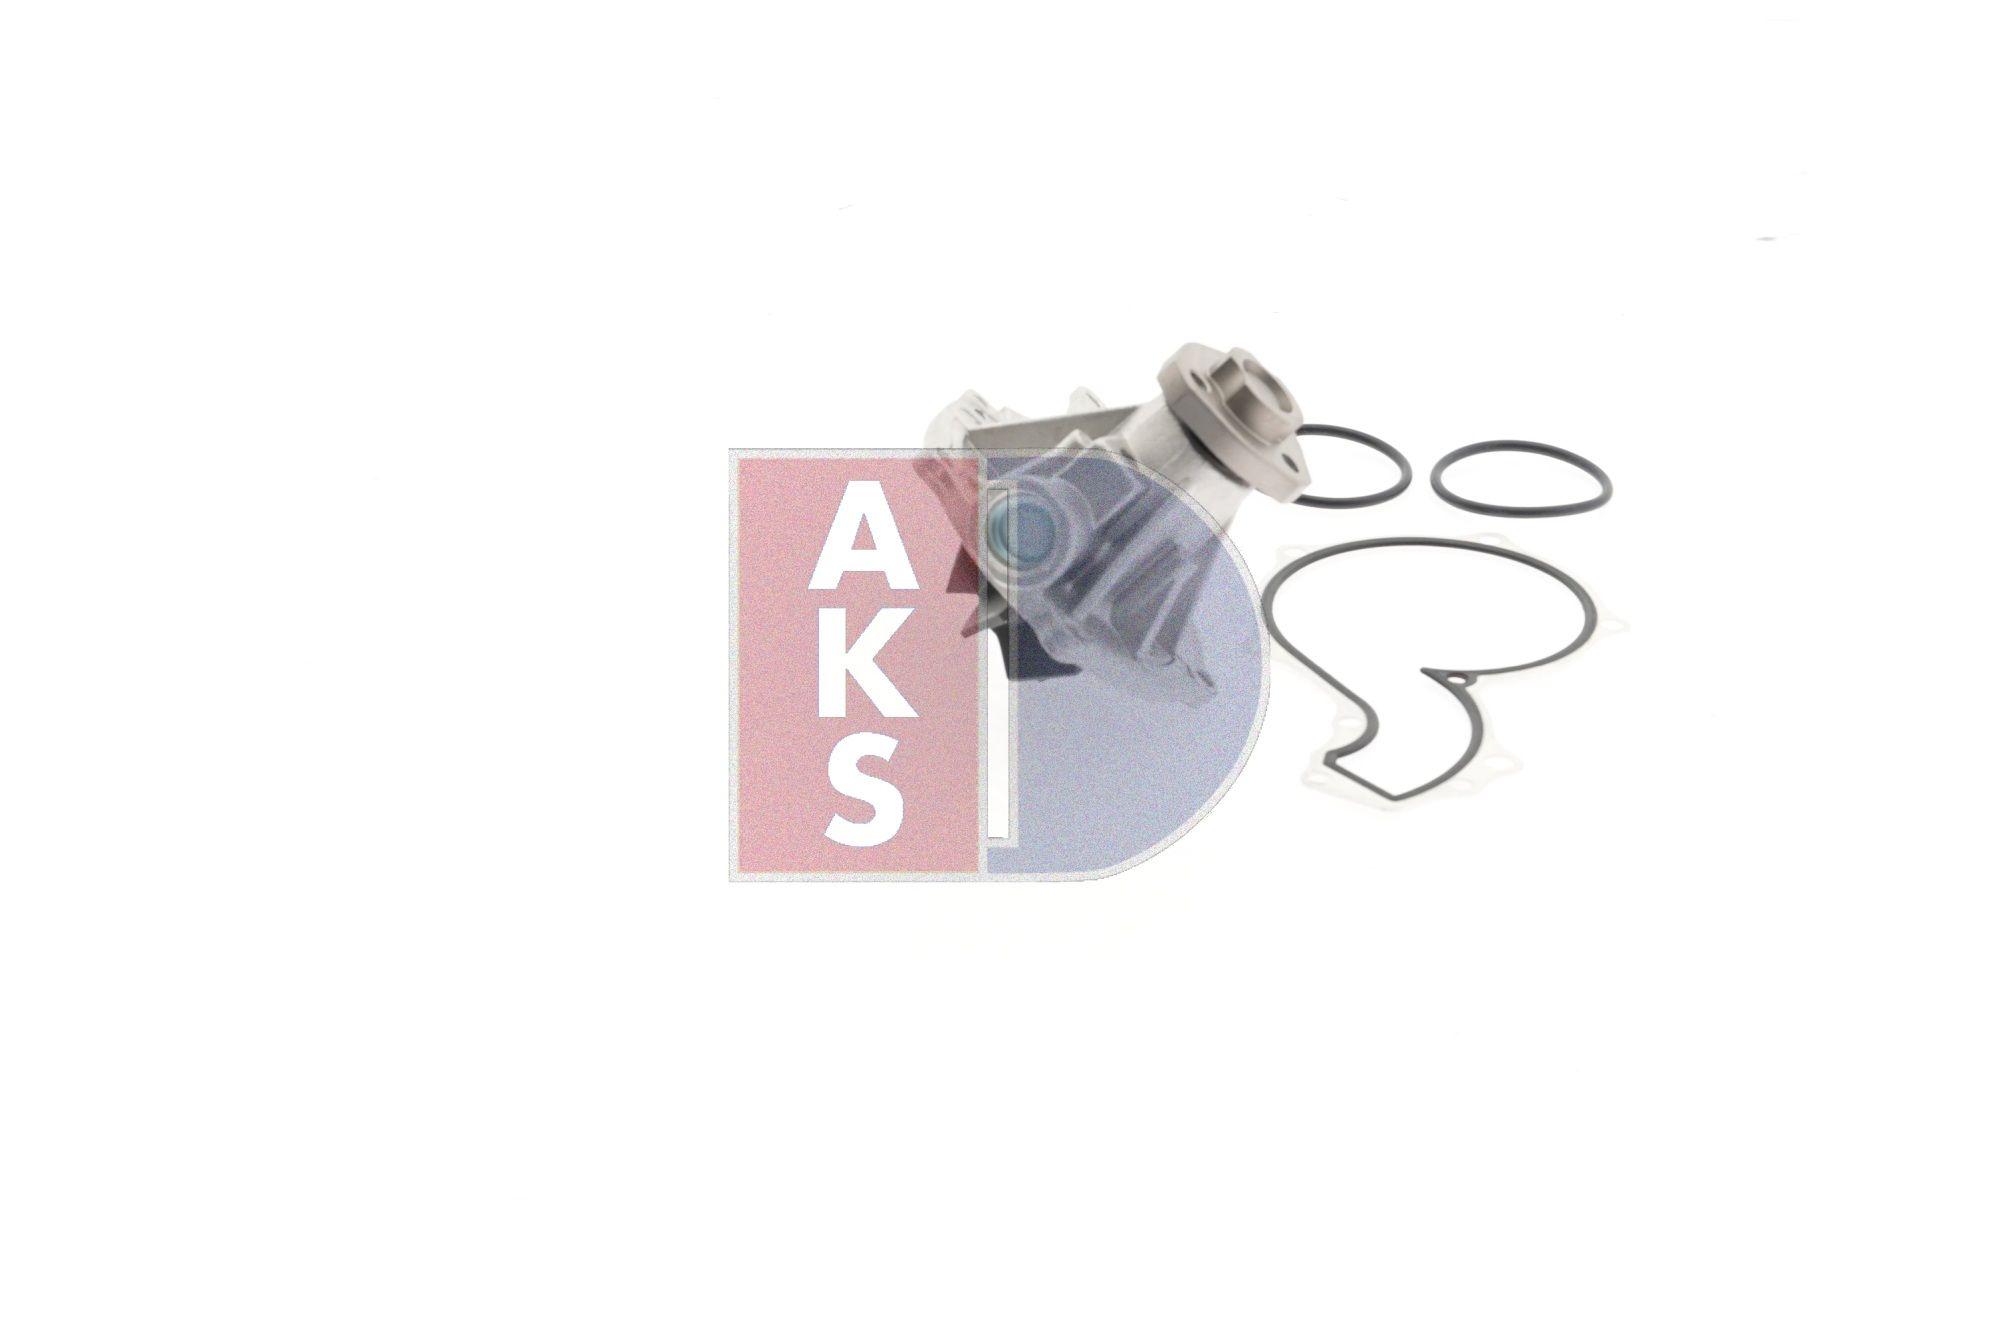 570004N Wasserpumpe AKS DASIS Test